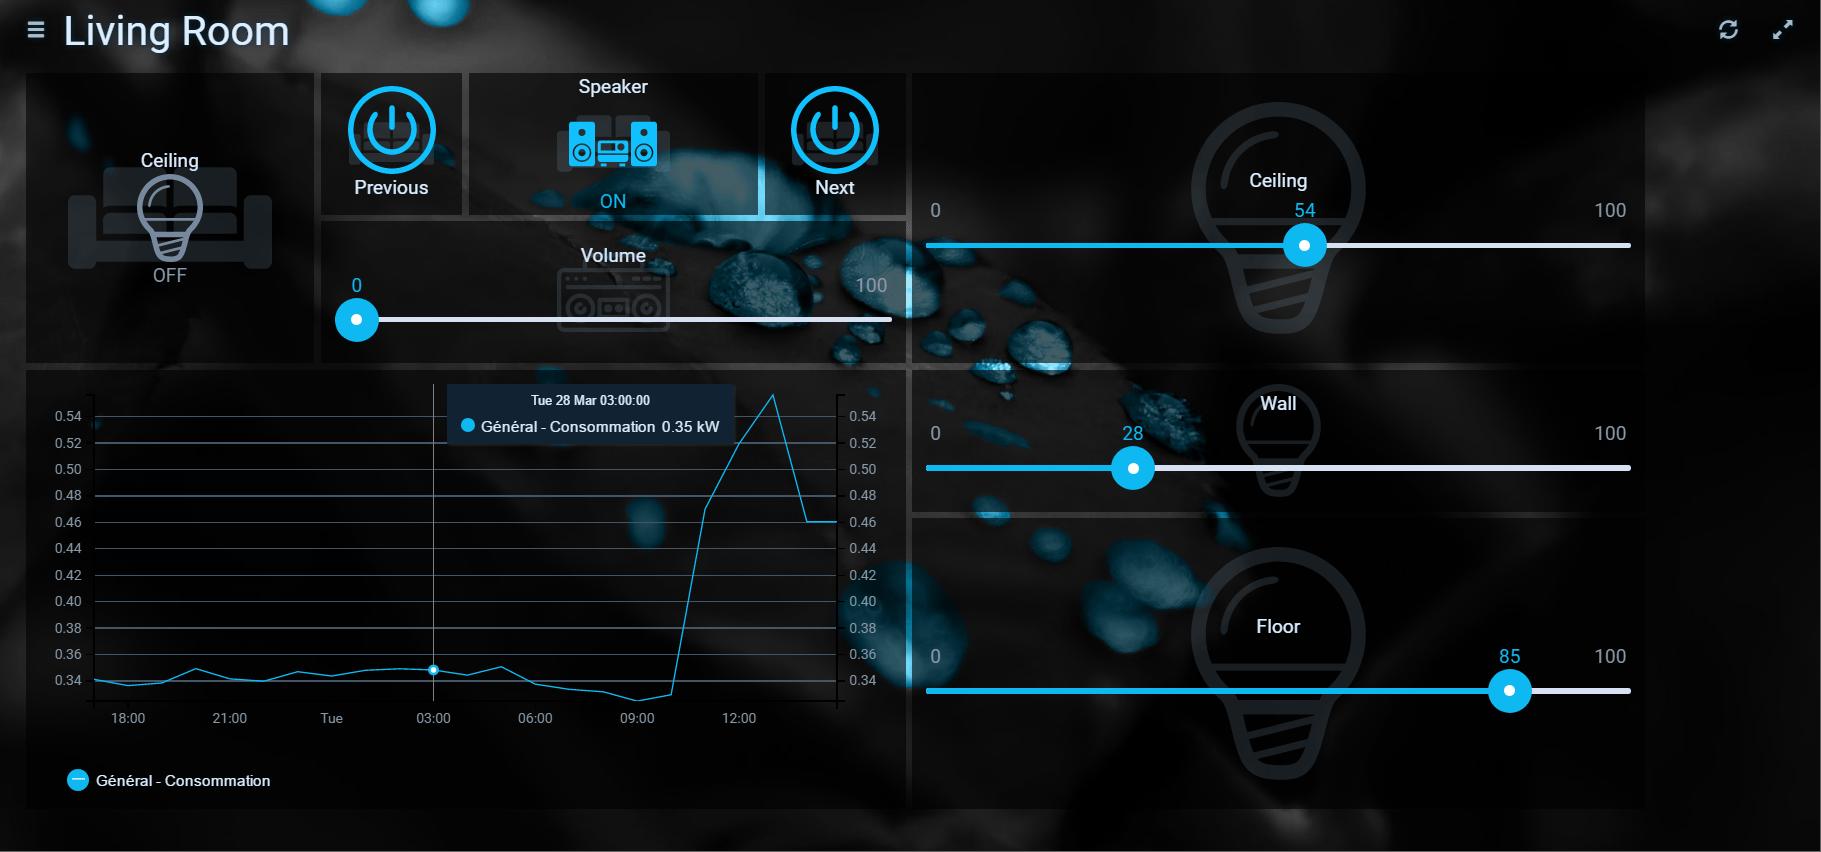 realknx plug play voice control siri alexa assistant